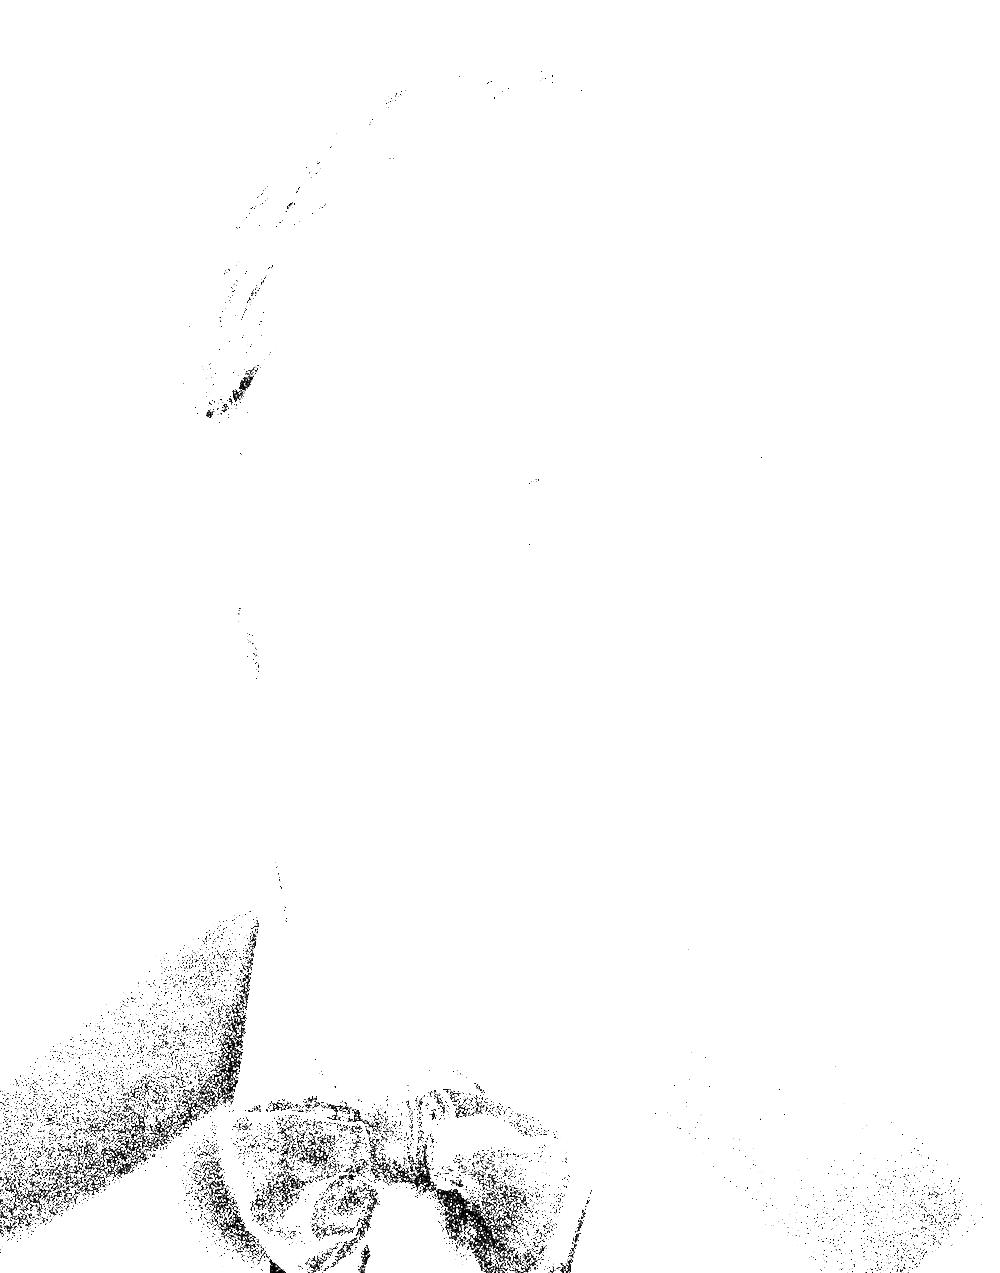 benny-4396.png